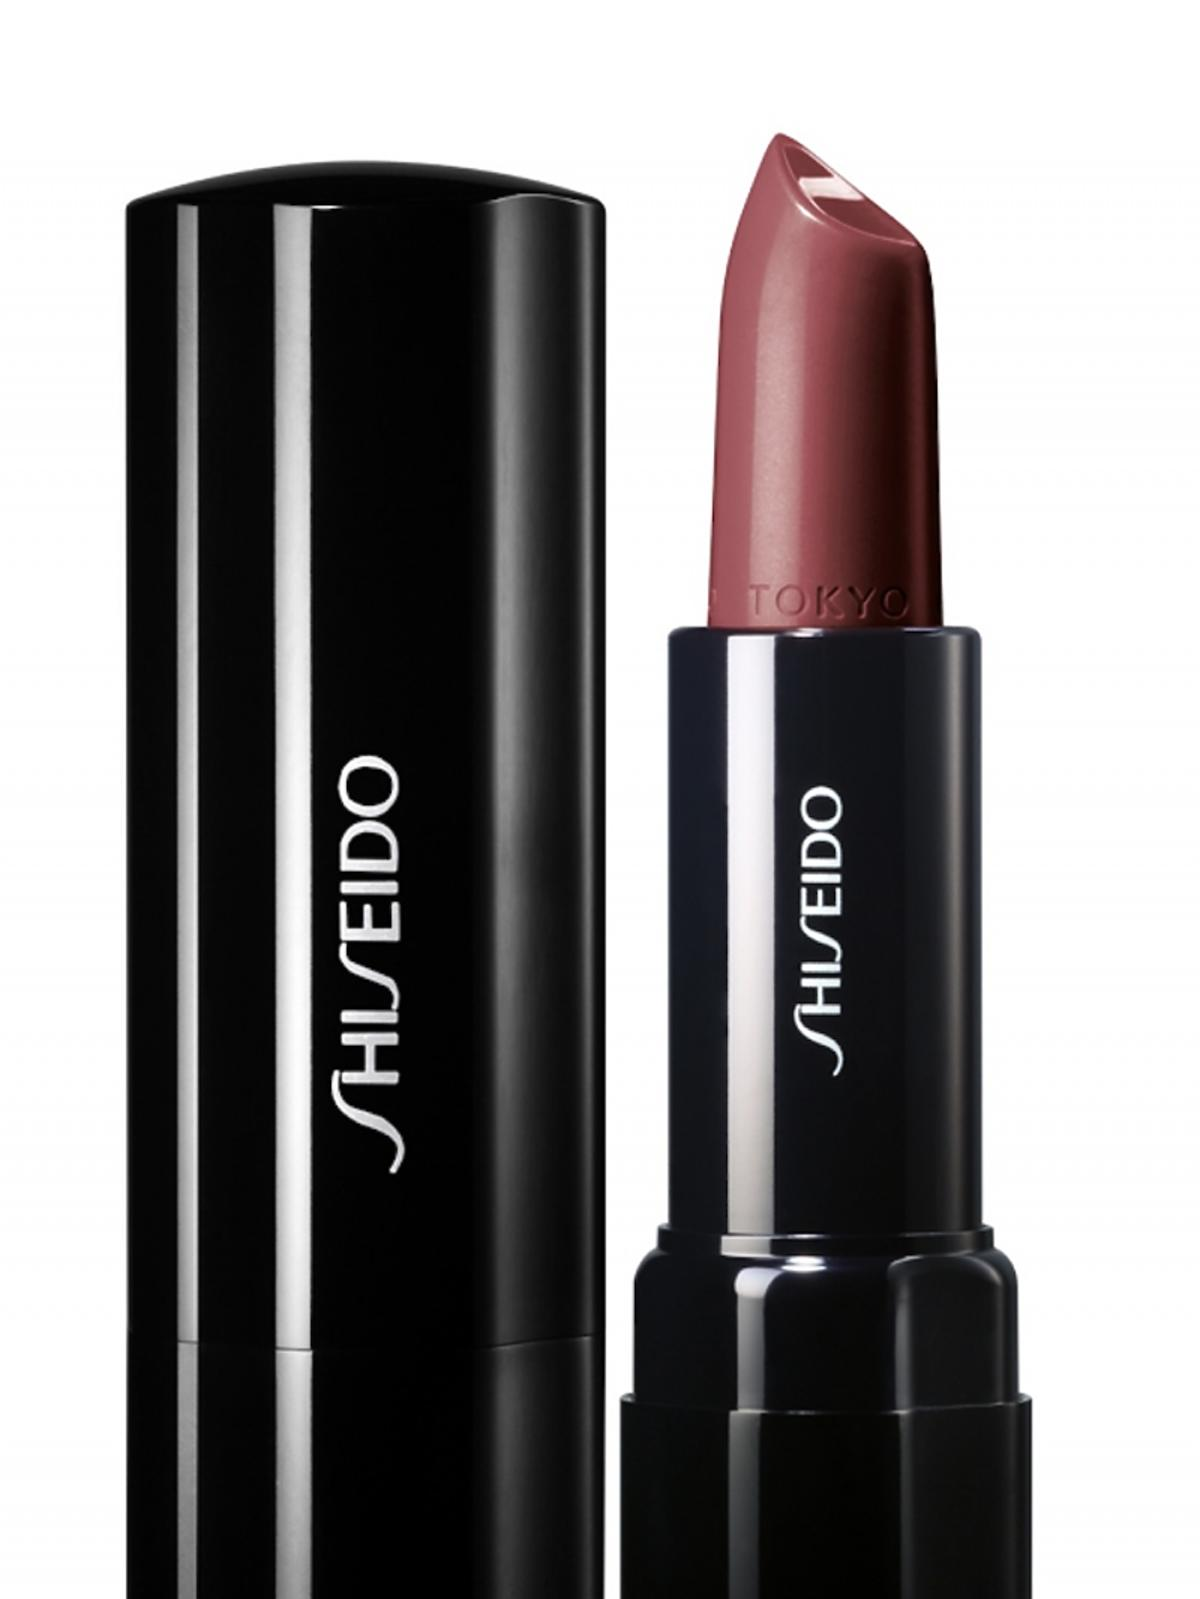 Kremowa pomadka do ust Perfect Rouge, Shiseido, 105 zł